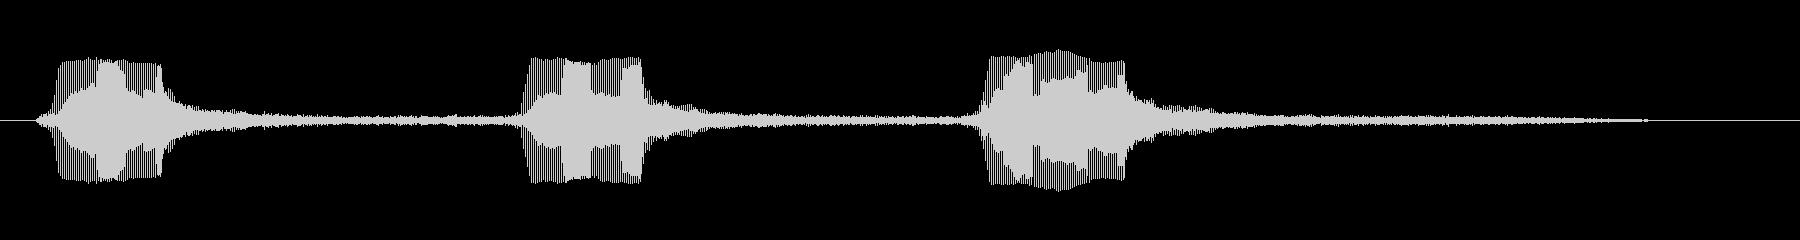 SHIPS HORN、3ショートブ...の未再生の波形